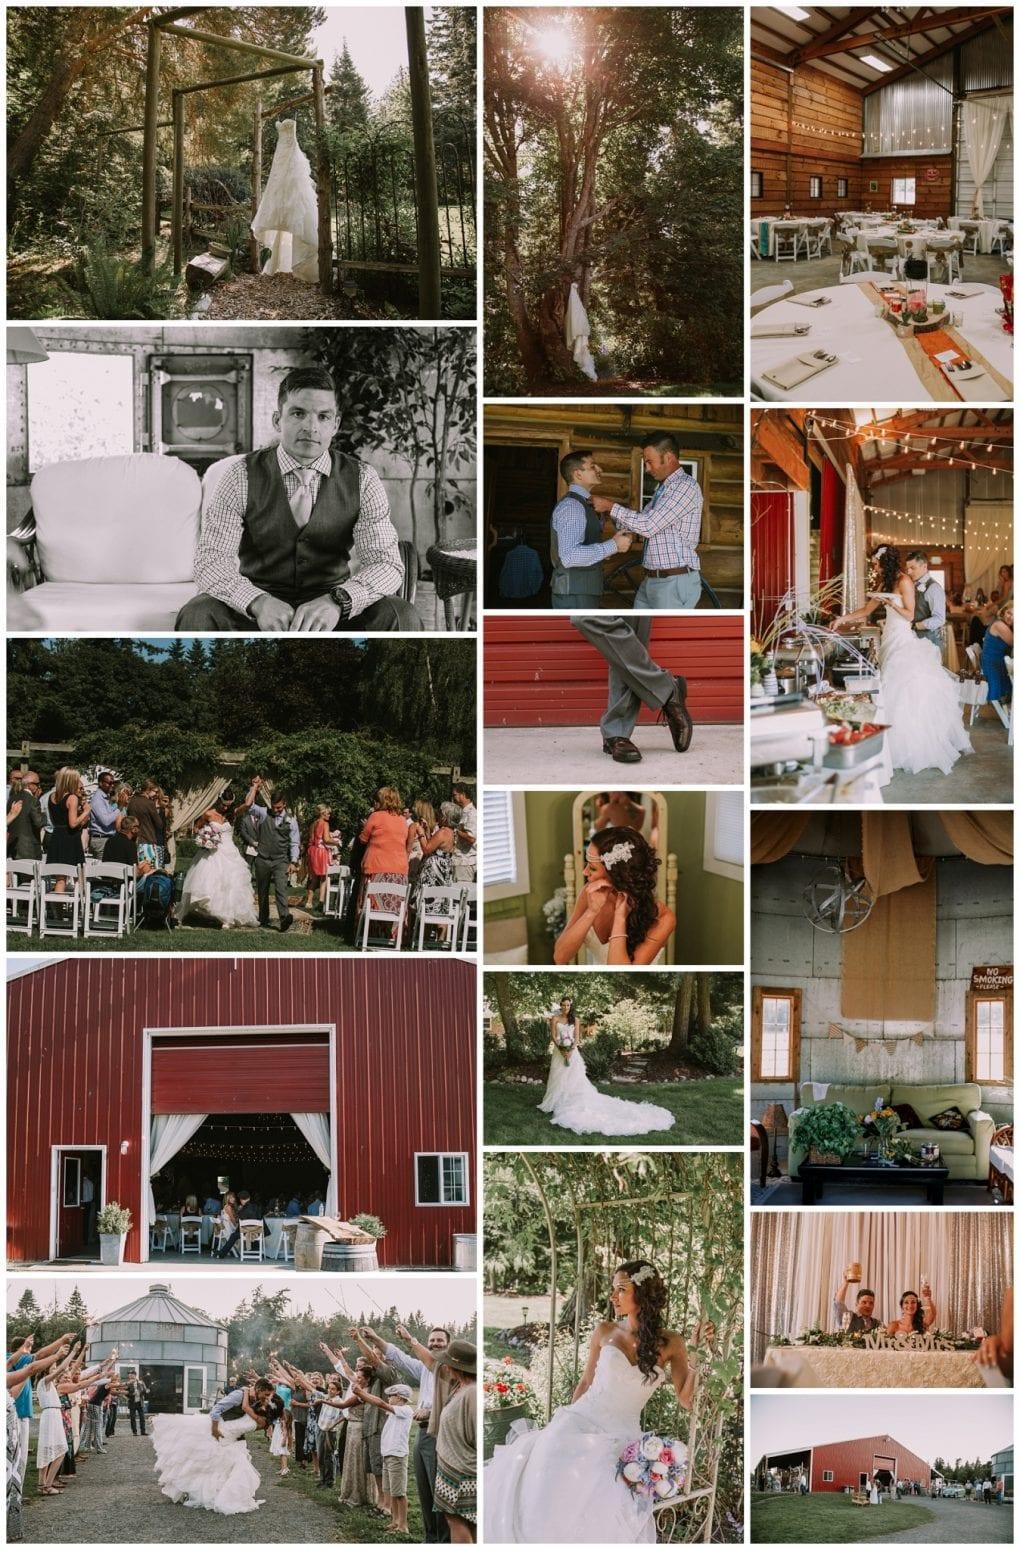 greenfieldfarmwashingtonweddingvenues01 Seattle and Snohomish Wedding and Engagement Photography by GSquared Weddings Photography